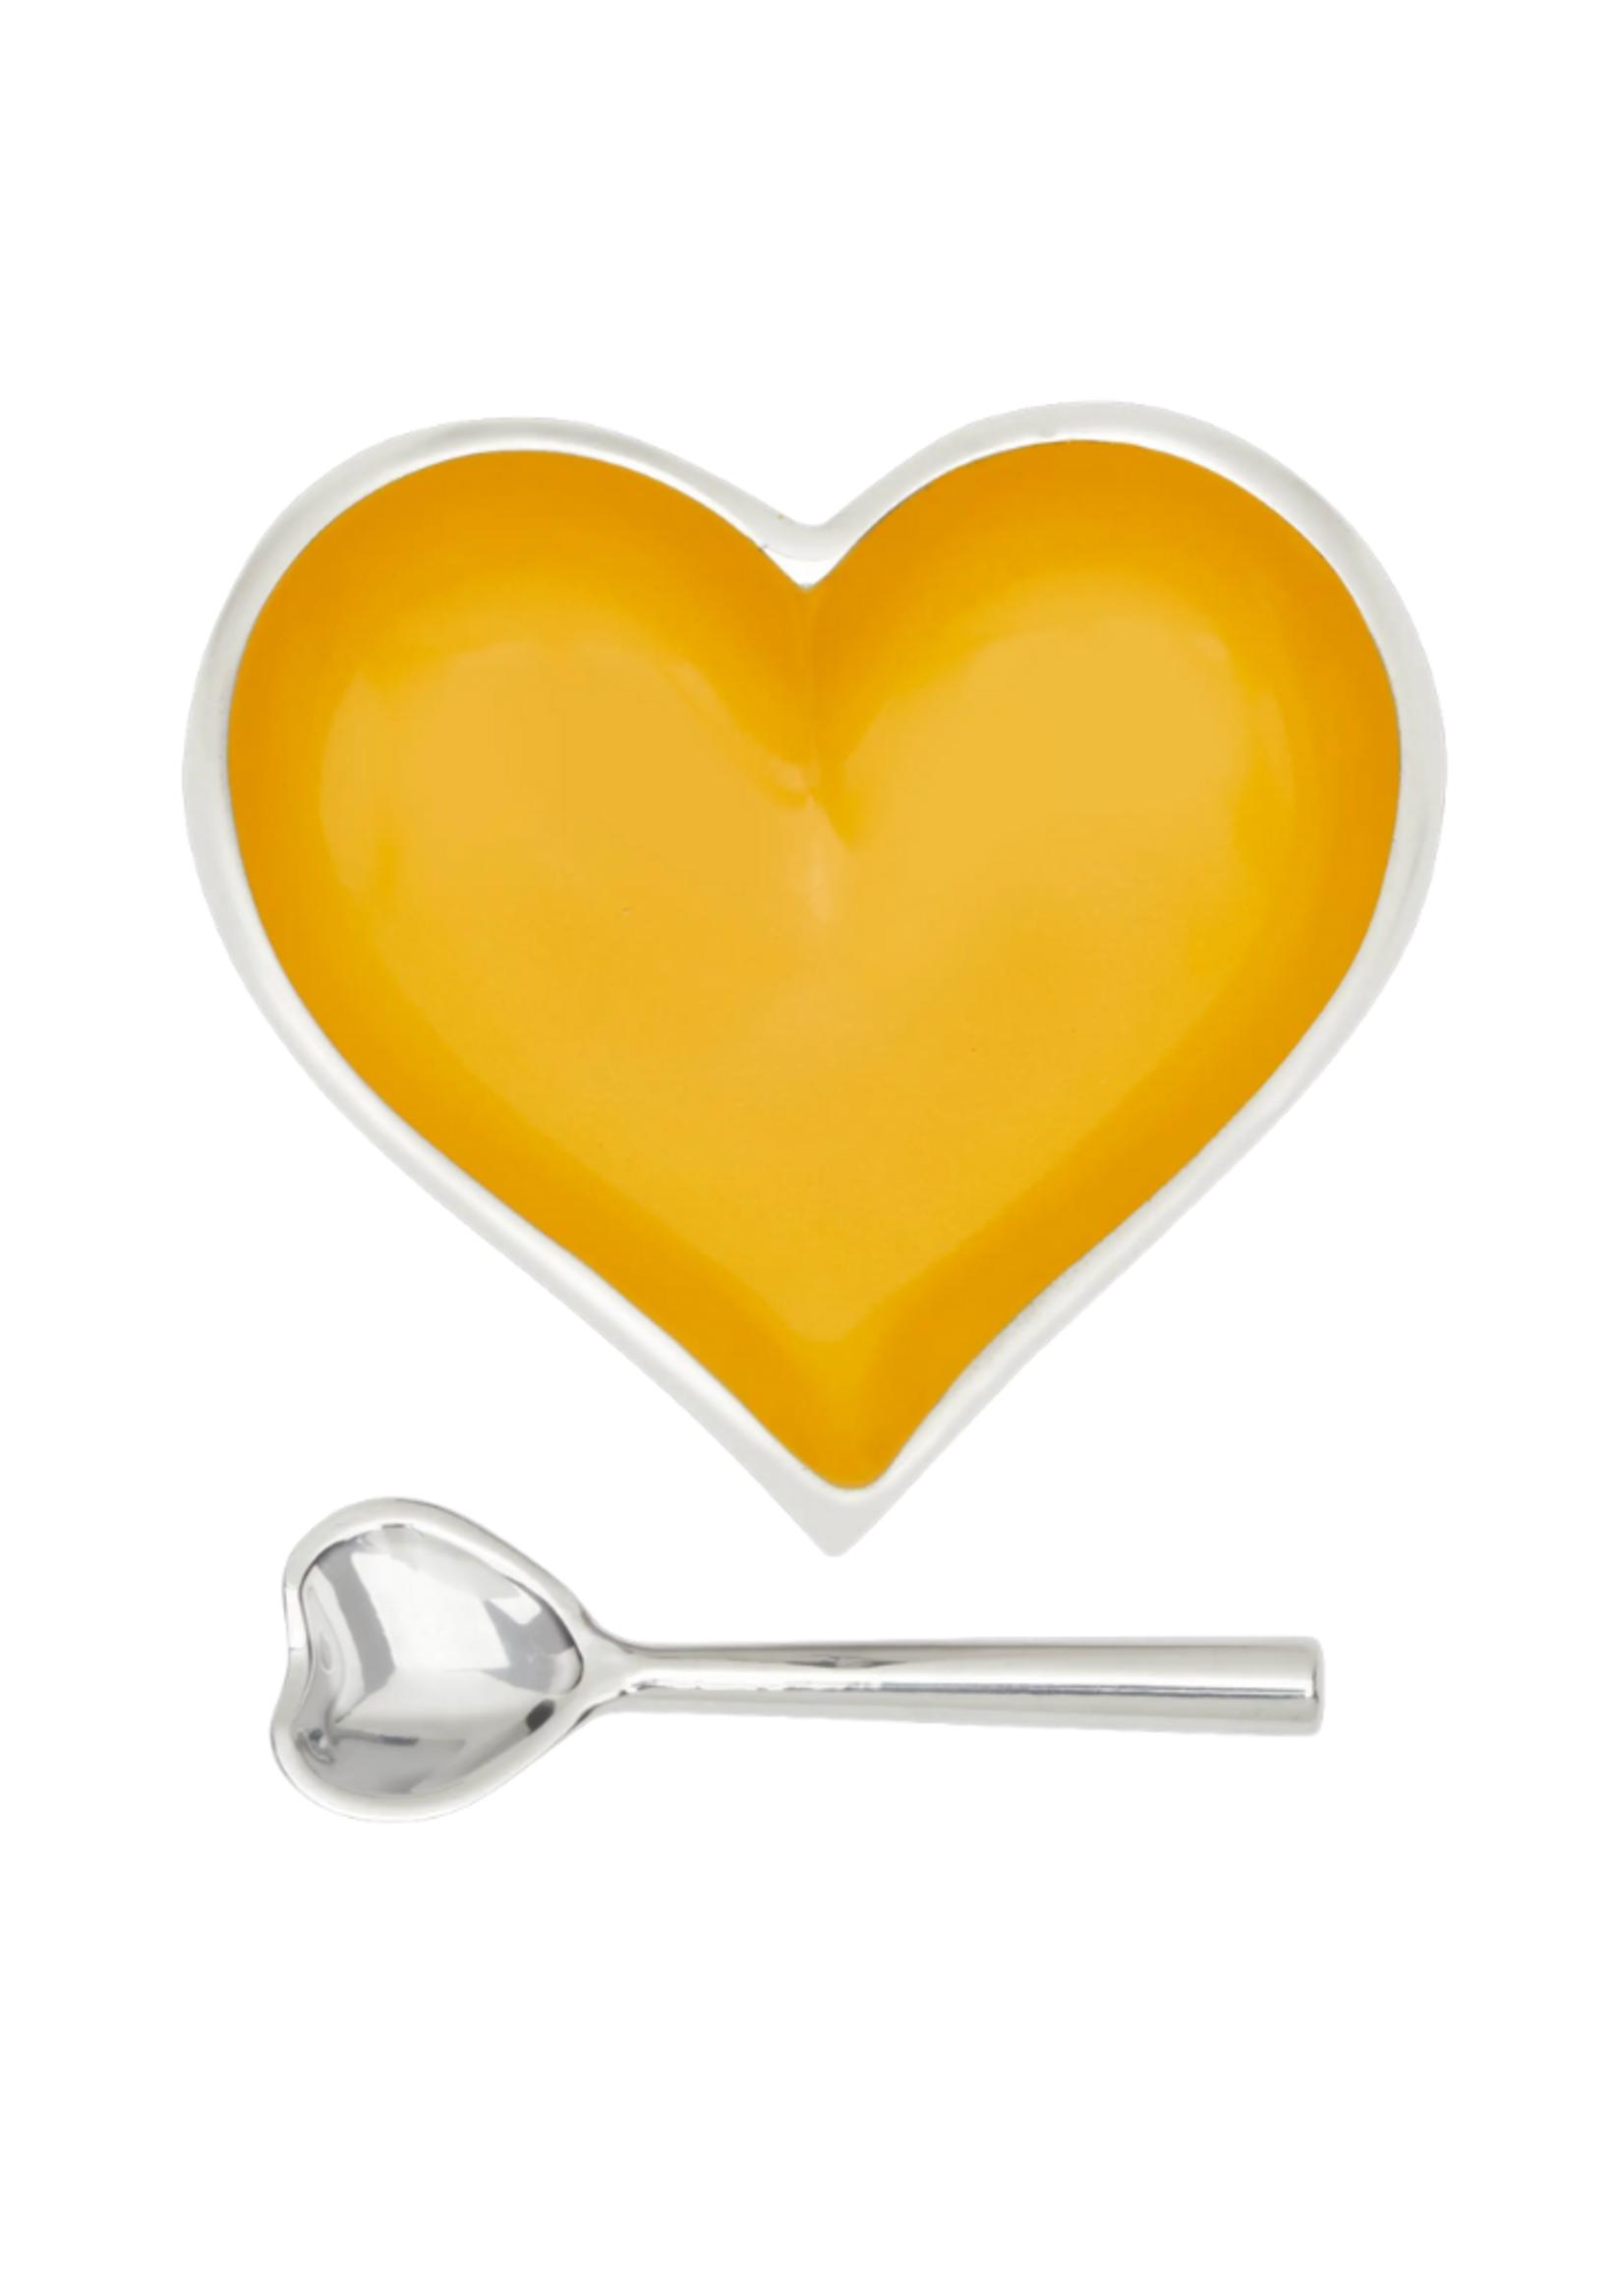 Happy Heart Bowl w Spoon // Goldenrod